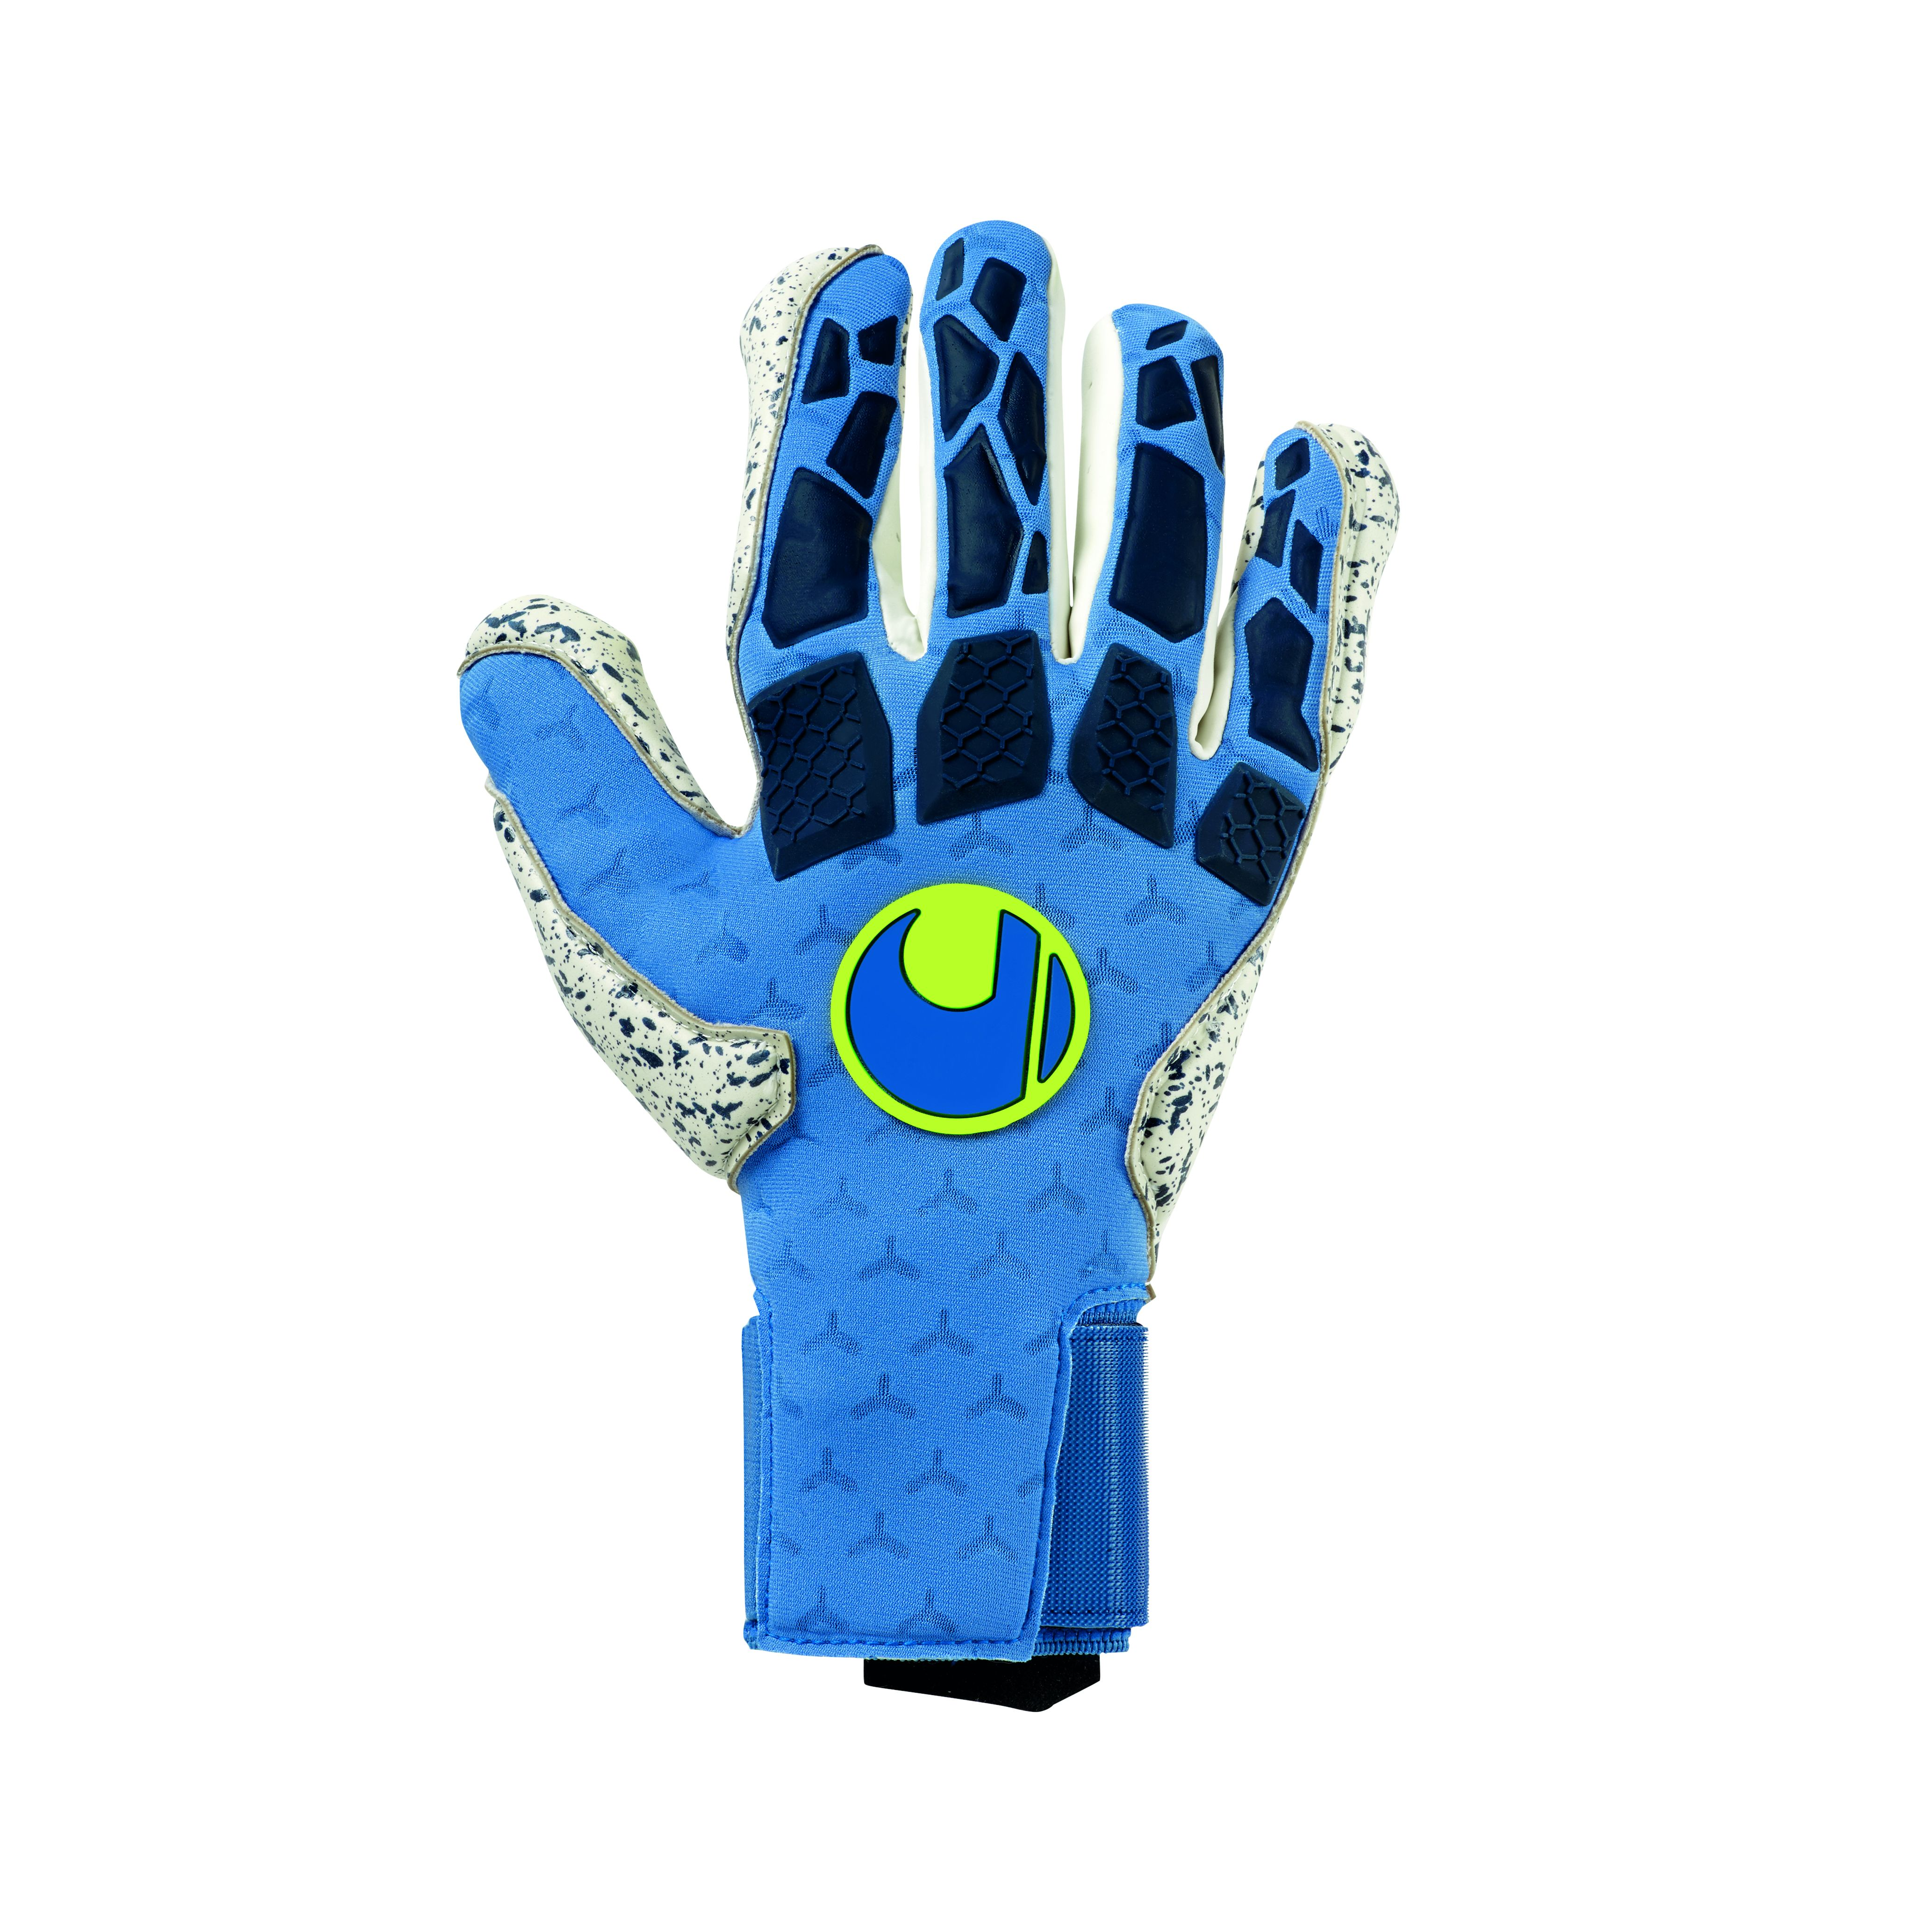 Uhlsport HYPERACT SUPERGRIP+ HN Keepershandschoenen Blauw Wit Geel